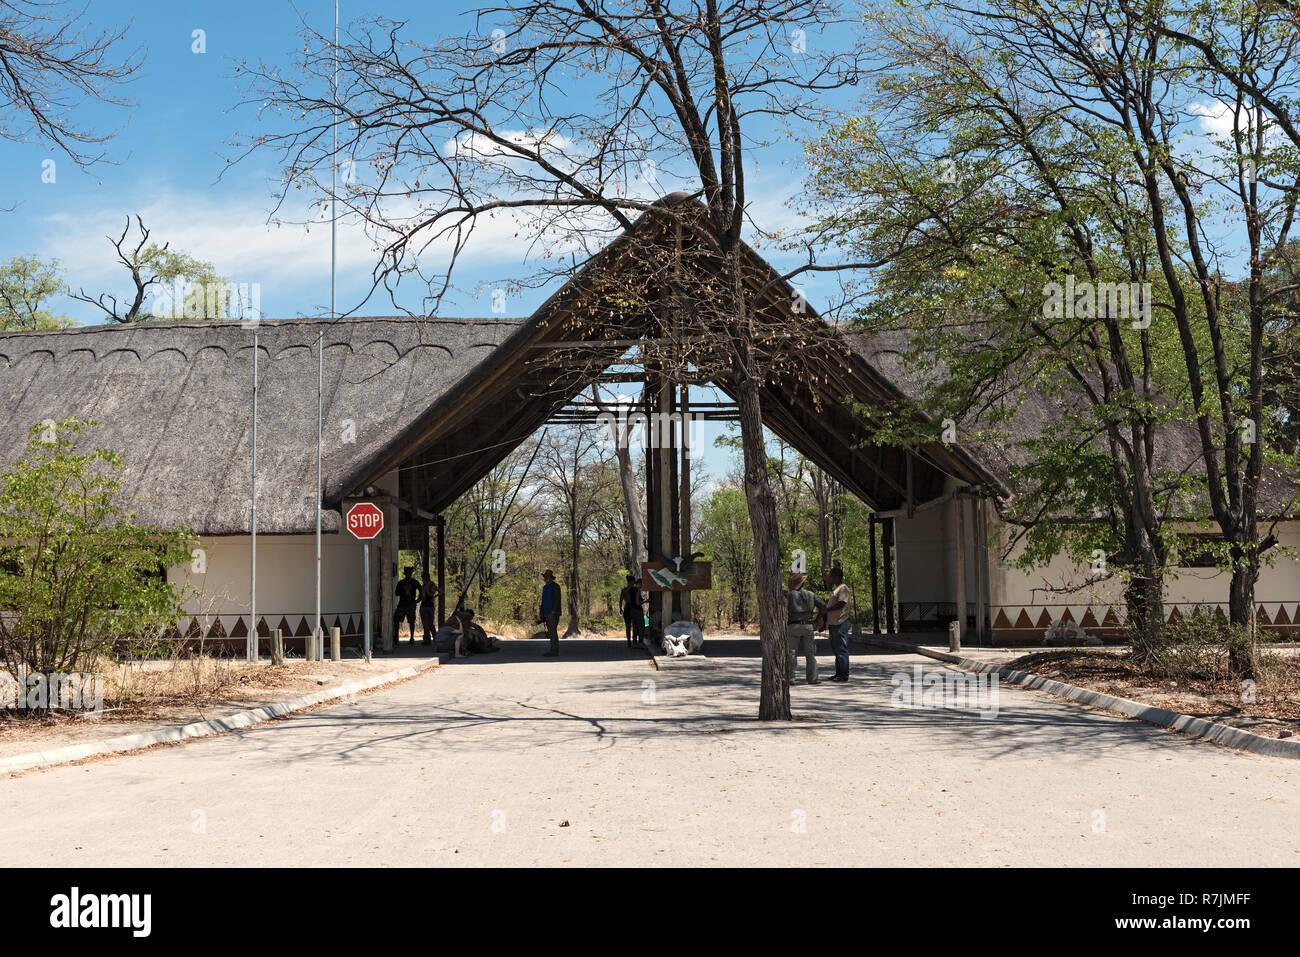 Eingangstor in das Moremi Game Reserve, Botswana, Afrika Stockbild